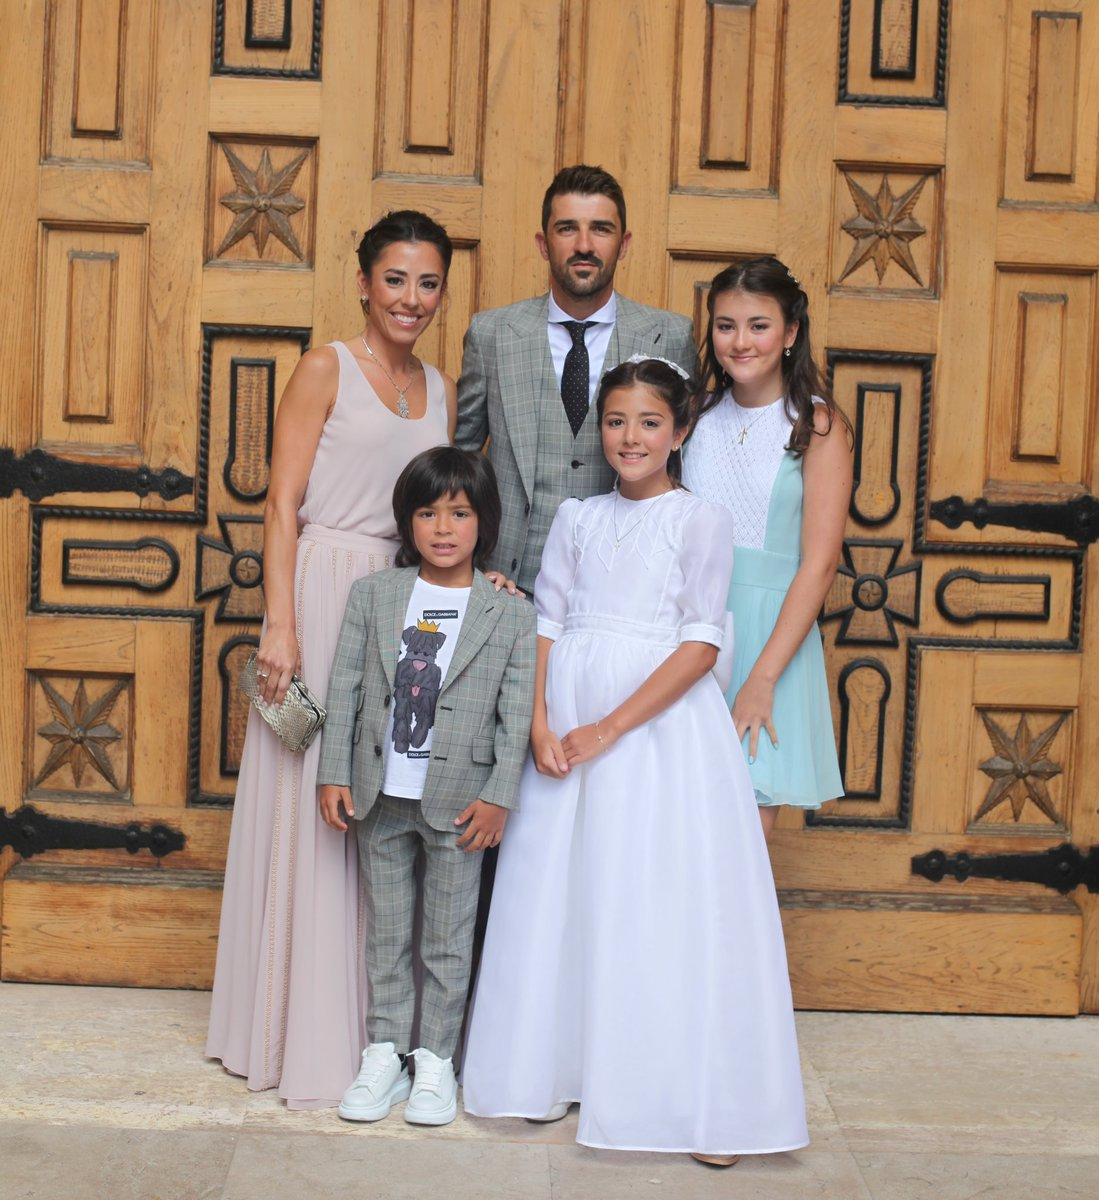 ♥🙏🎉 #olaya #primeracomunion #familia #familygoals #veranoenasturias